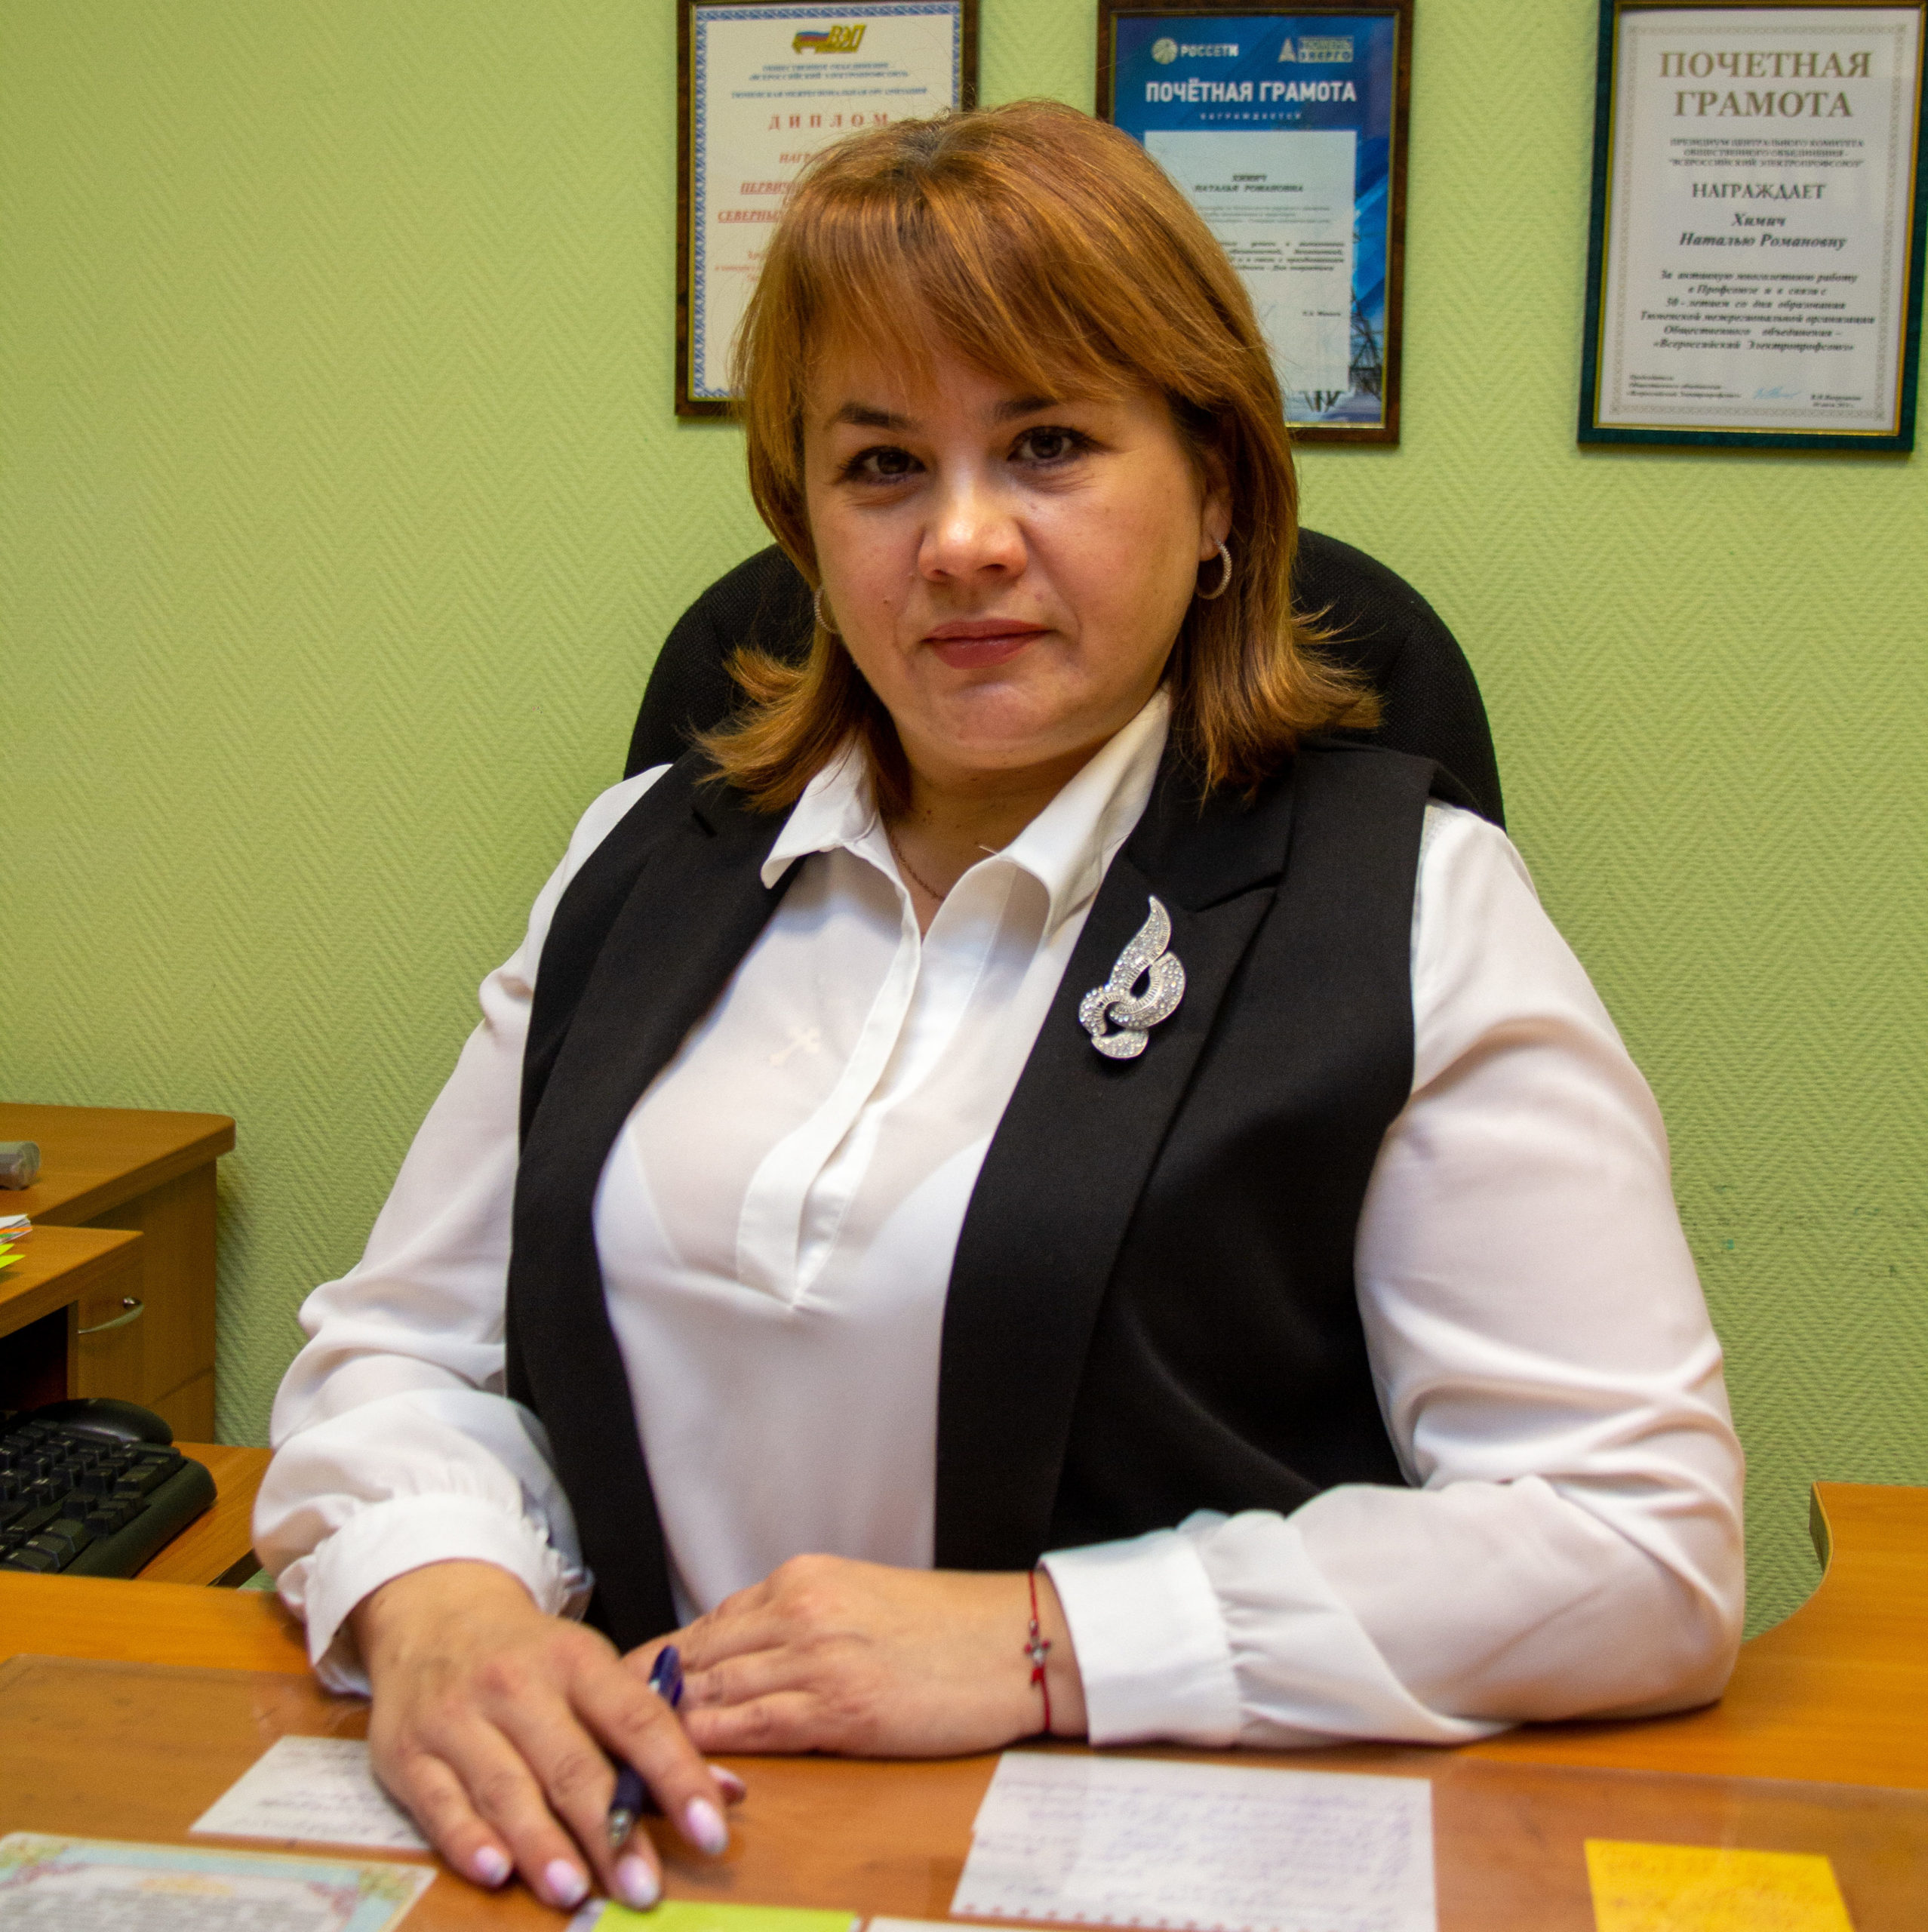 Химич Наталья Романовна